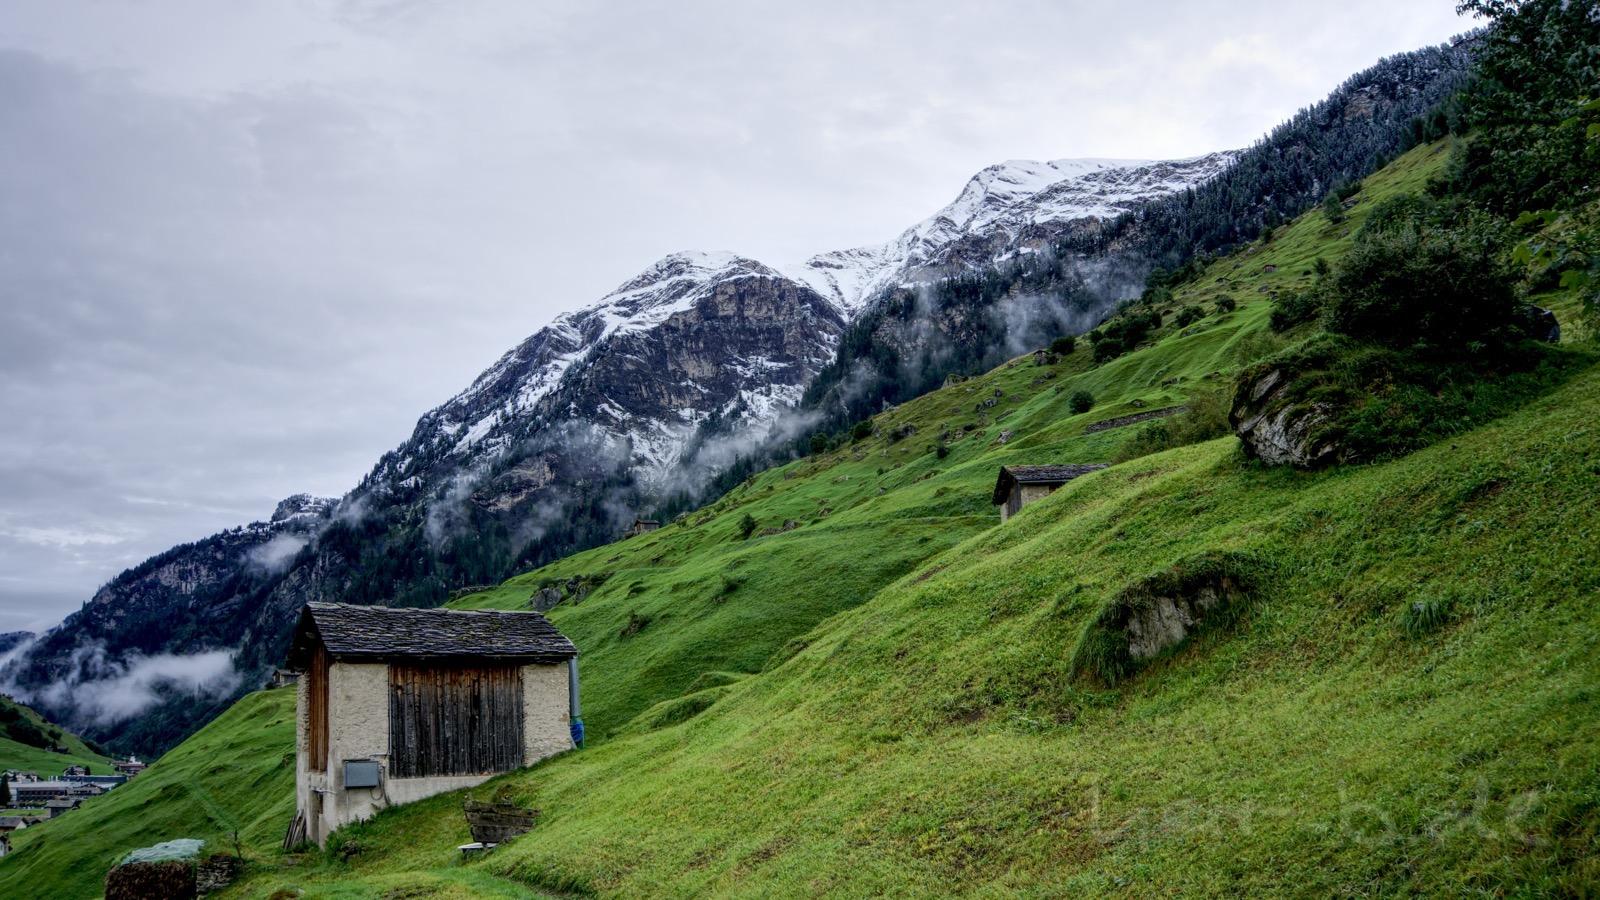 Morgen in Vals mit Schnee oberhalb des Hotels.